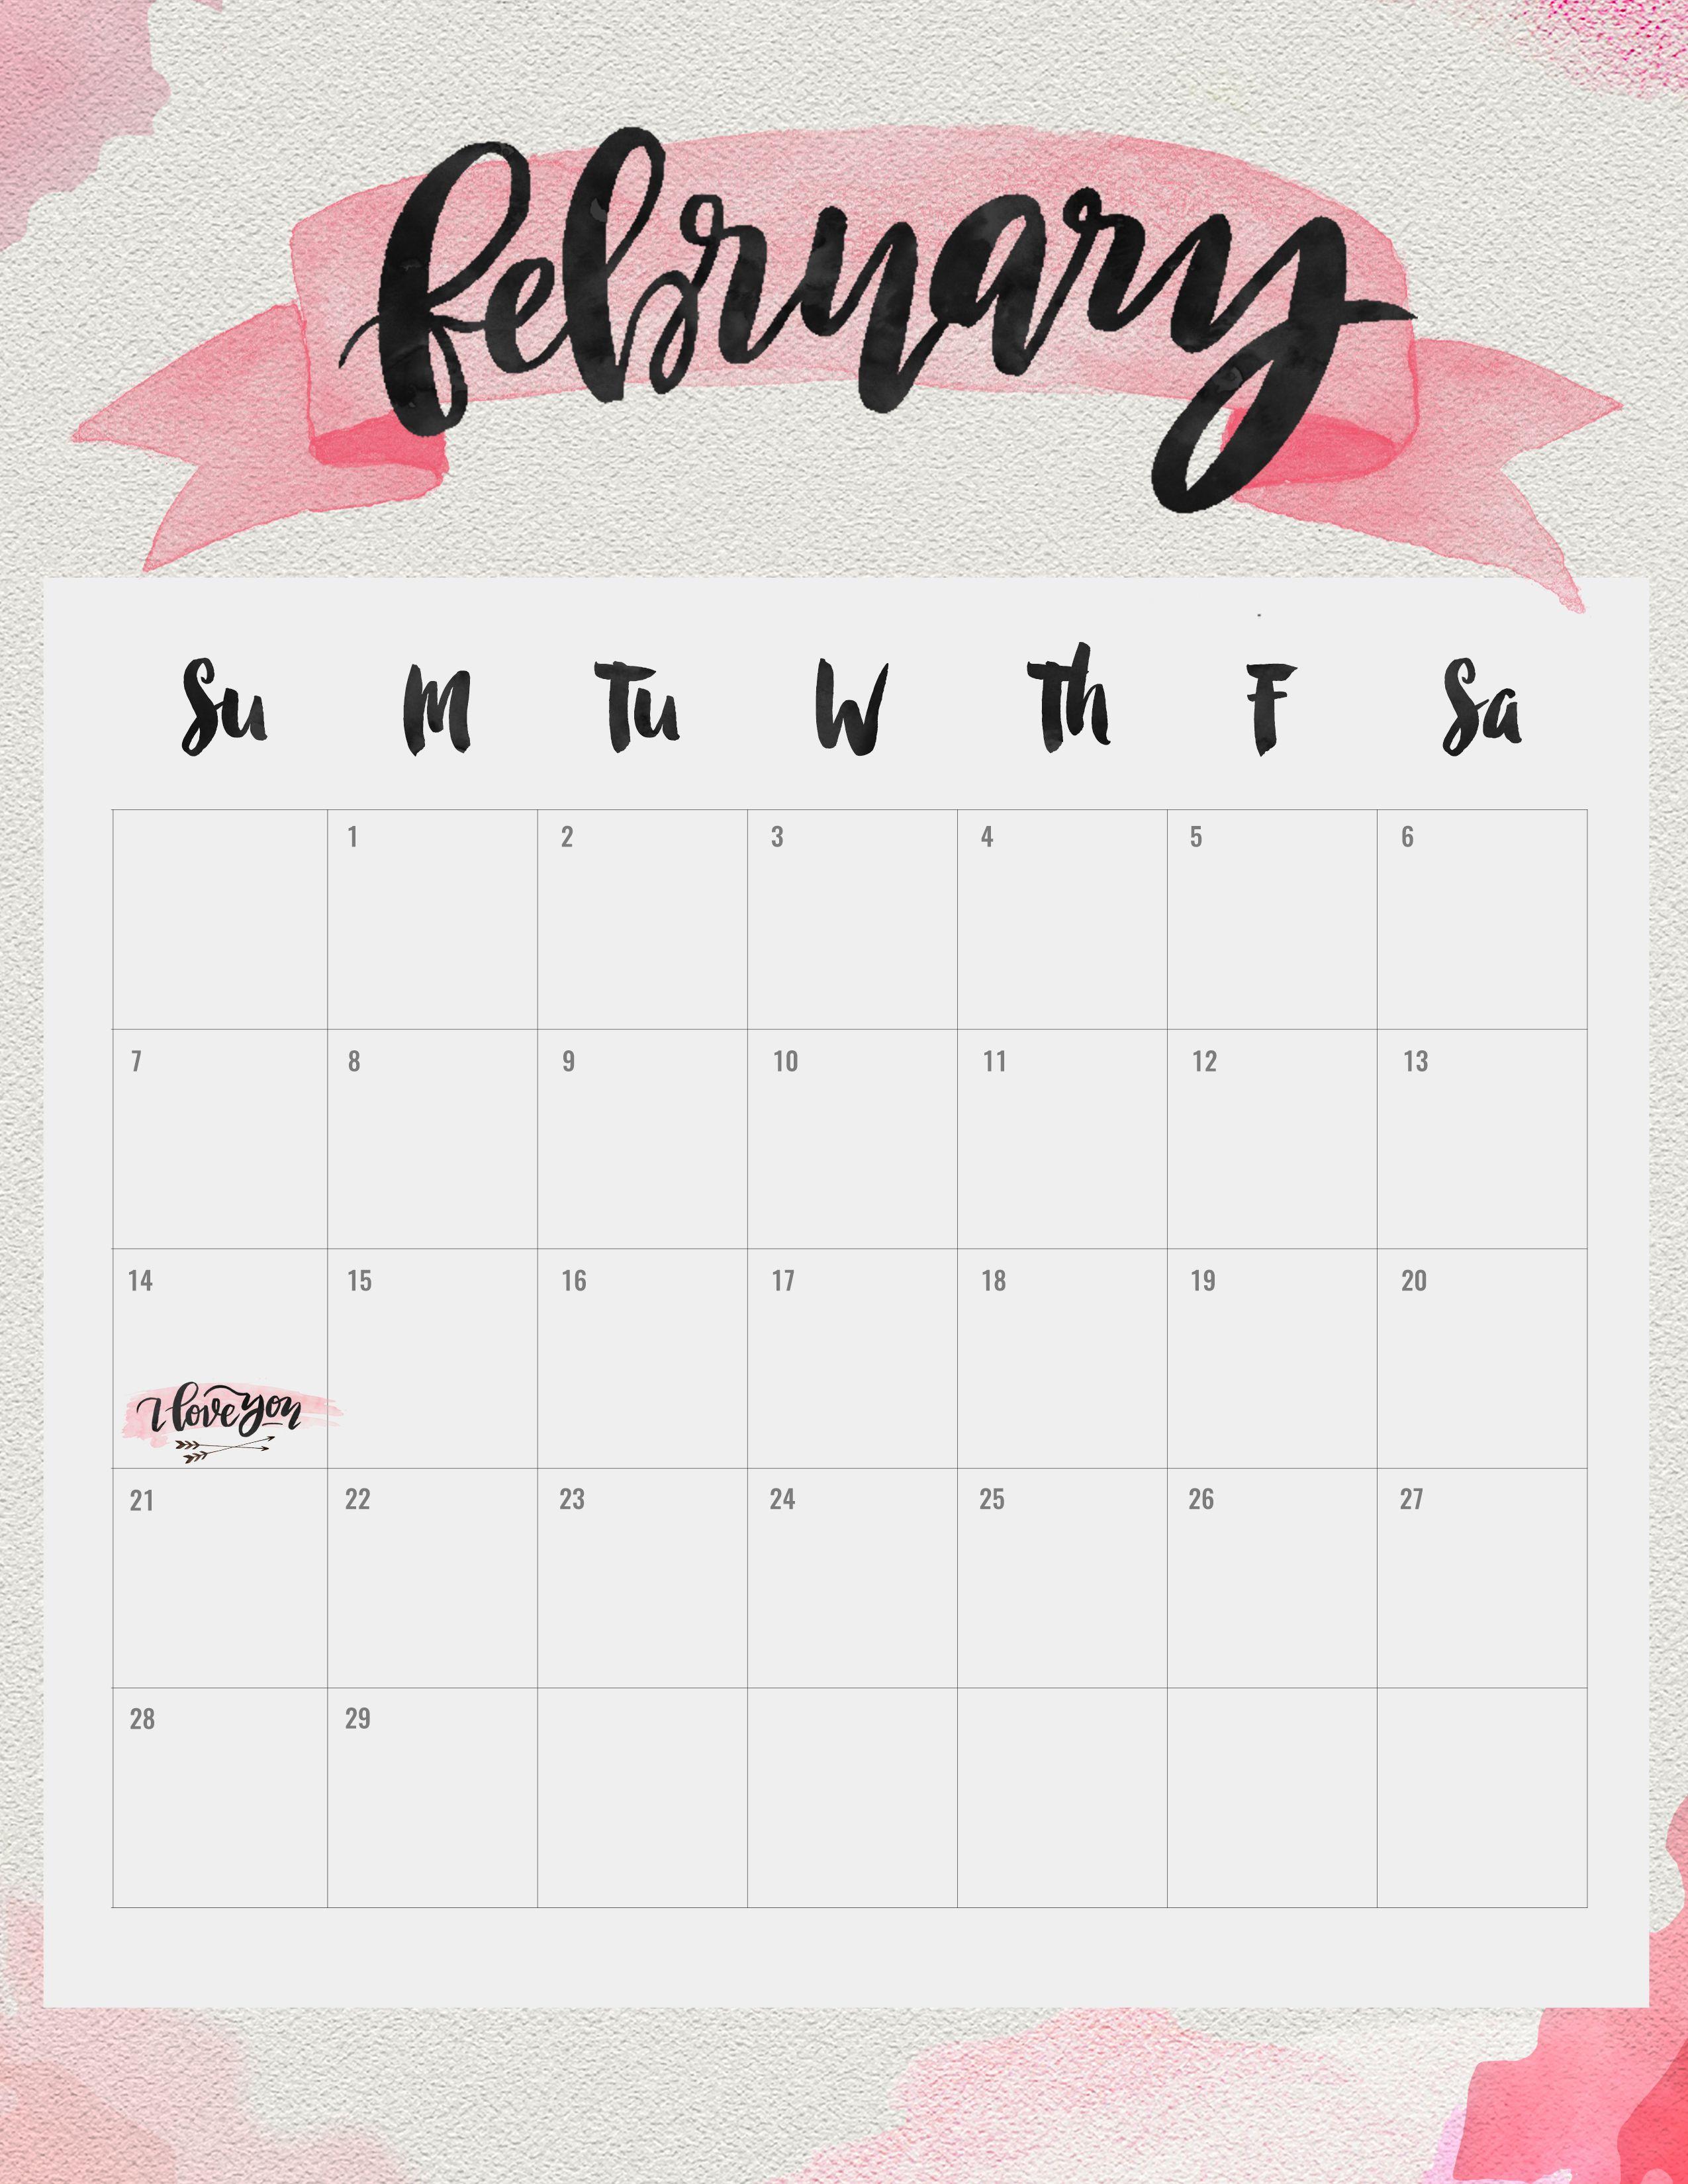 Printable February 2016 calendar by Jenny Highsmith